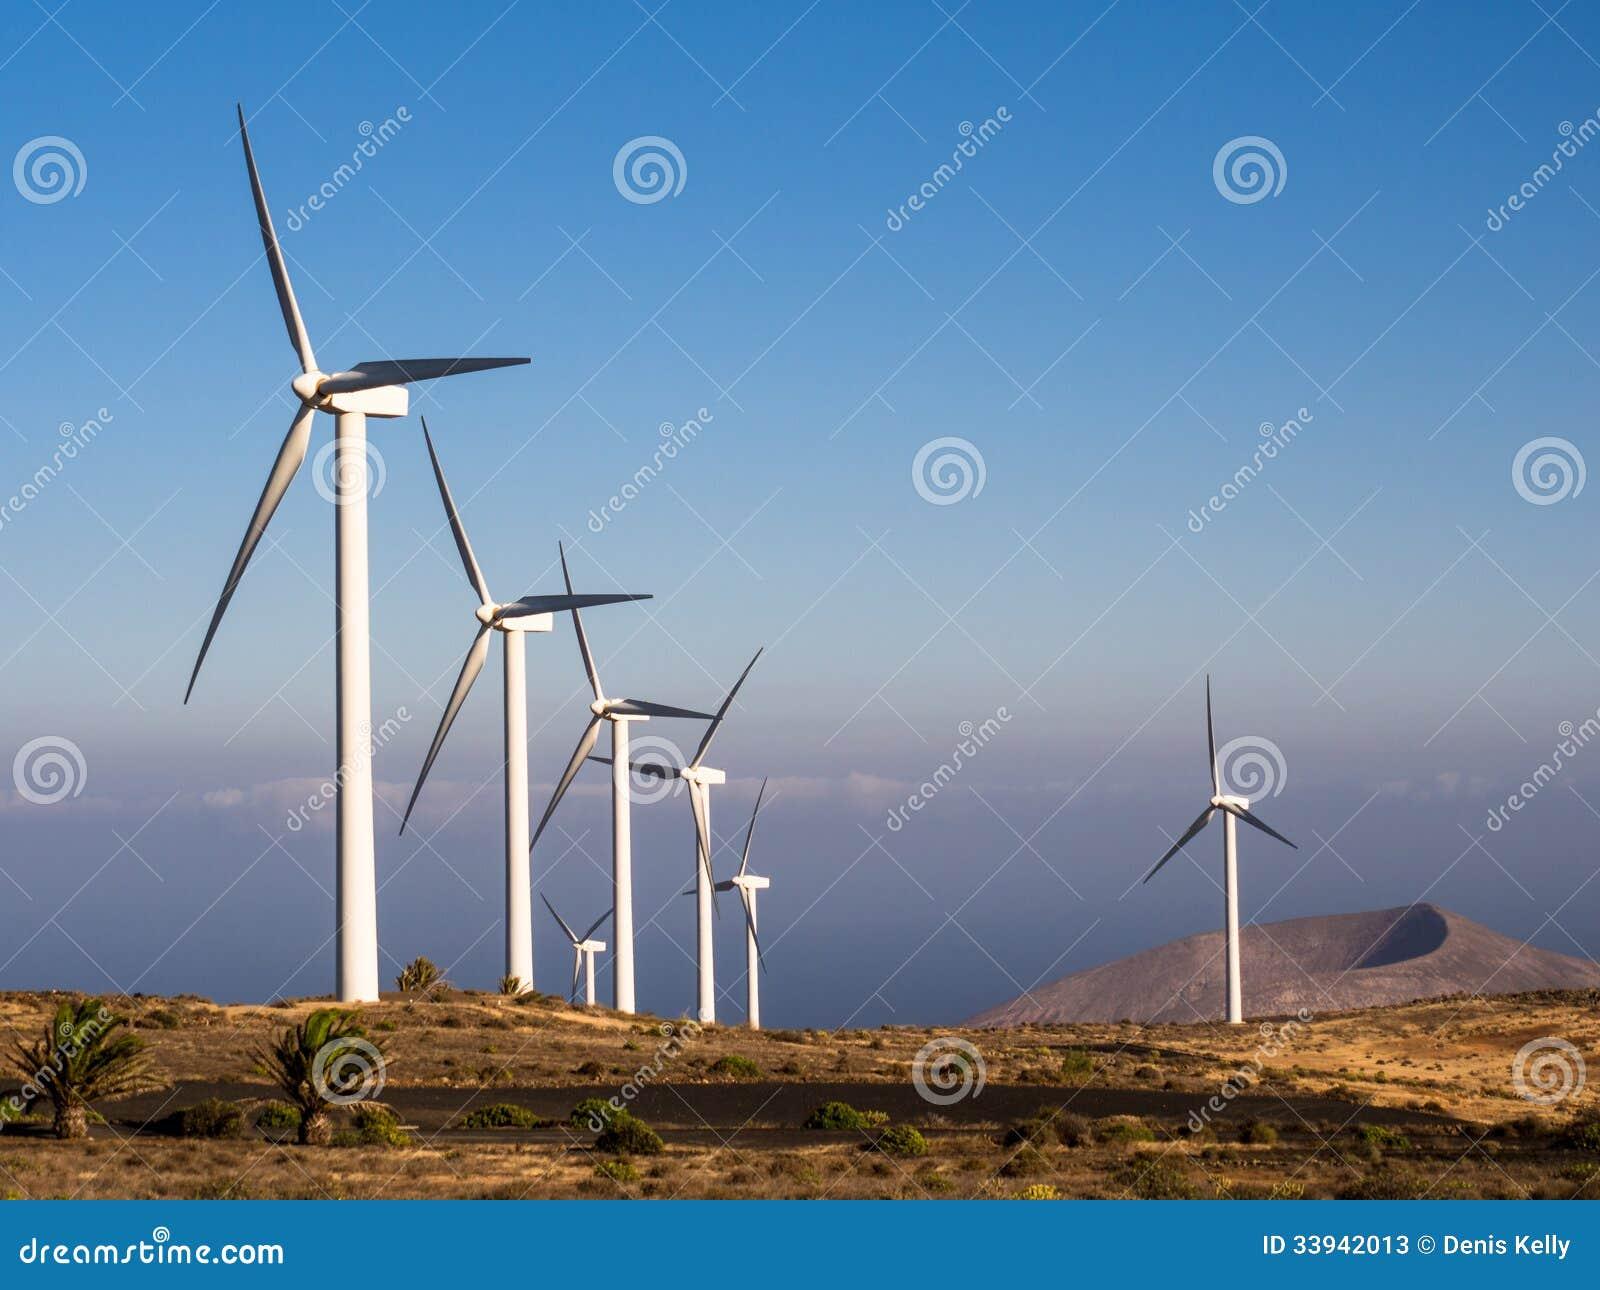 Wind Farm Turbines - Renewable Clean Green Energy